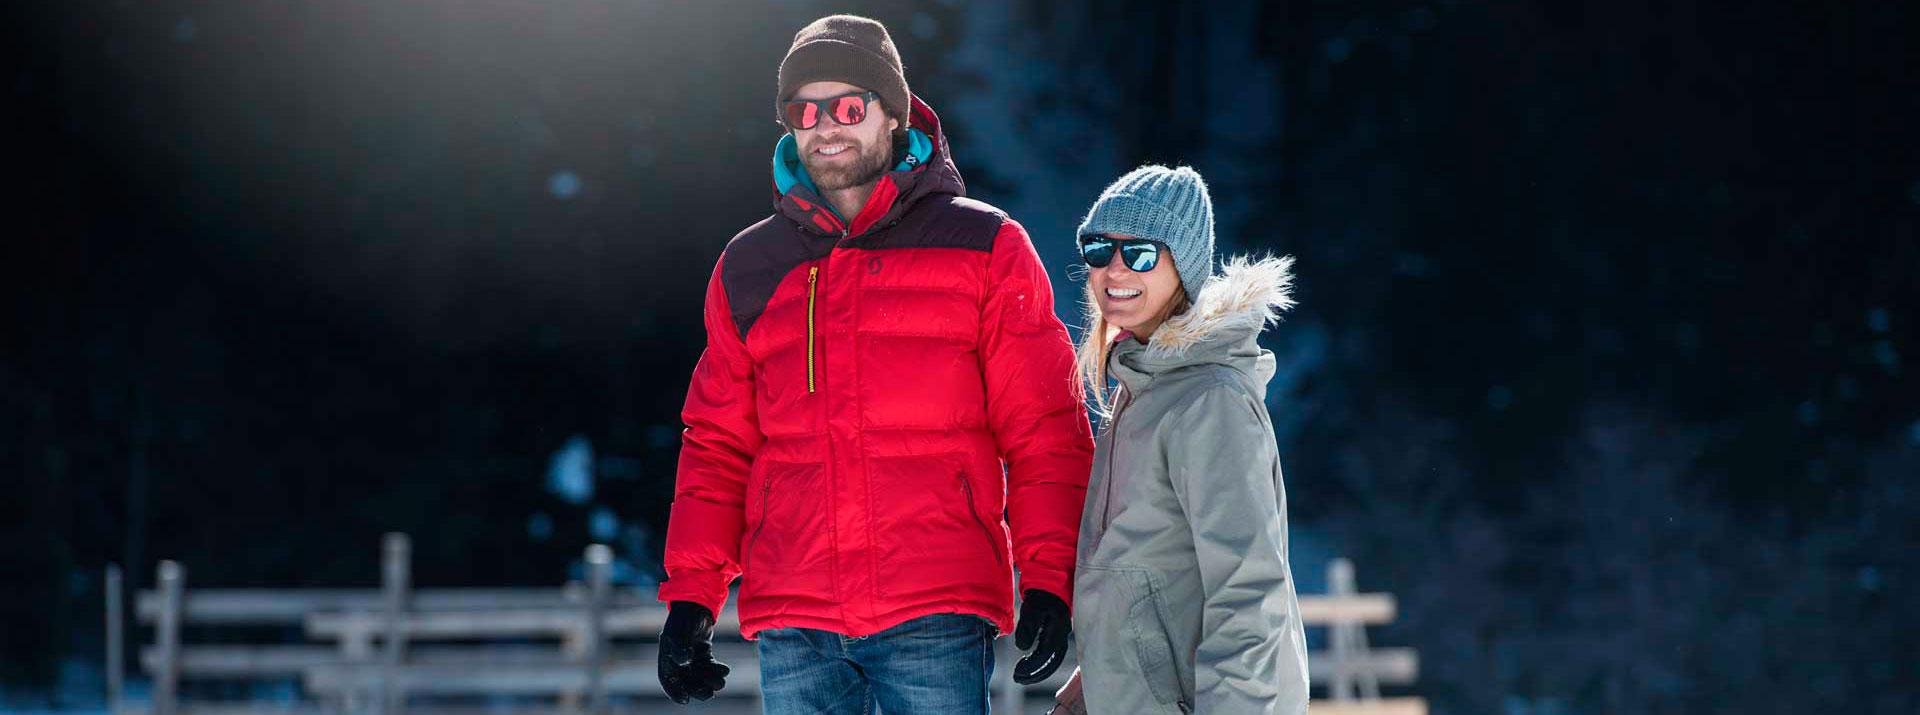 Winterwandern im Stubaital